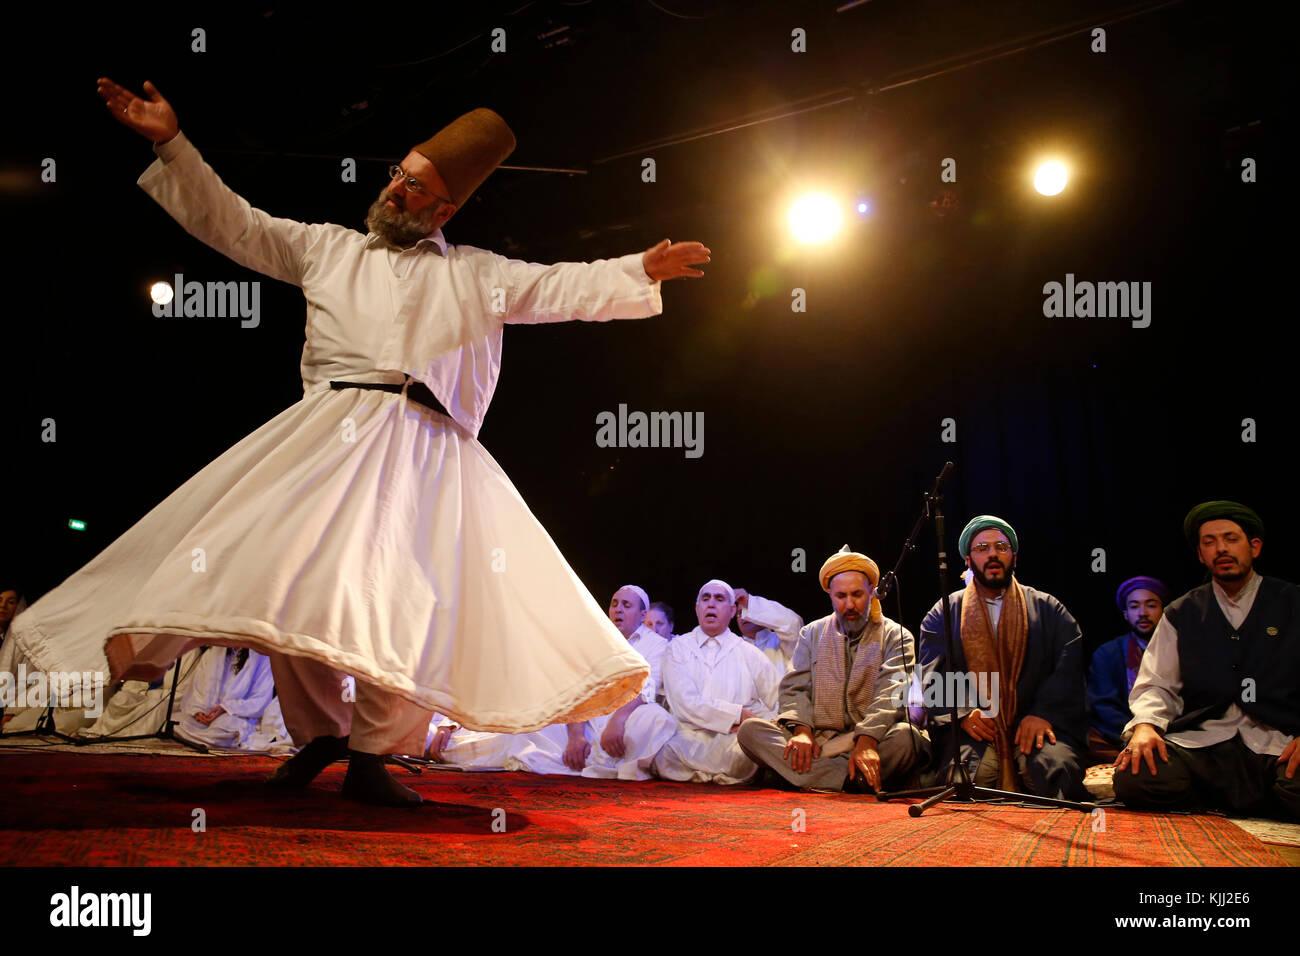 Mawlid (Prophet Muhammad's birthday) celebration in Paris, France. Whirling dervish. - Stock Image